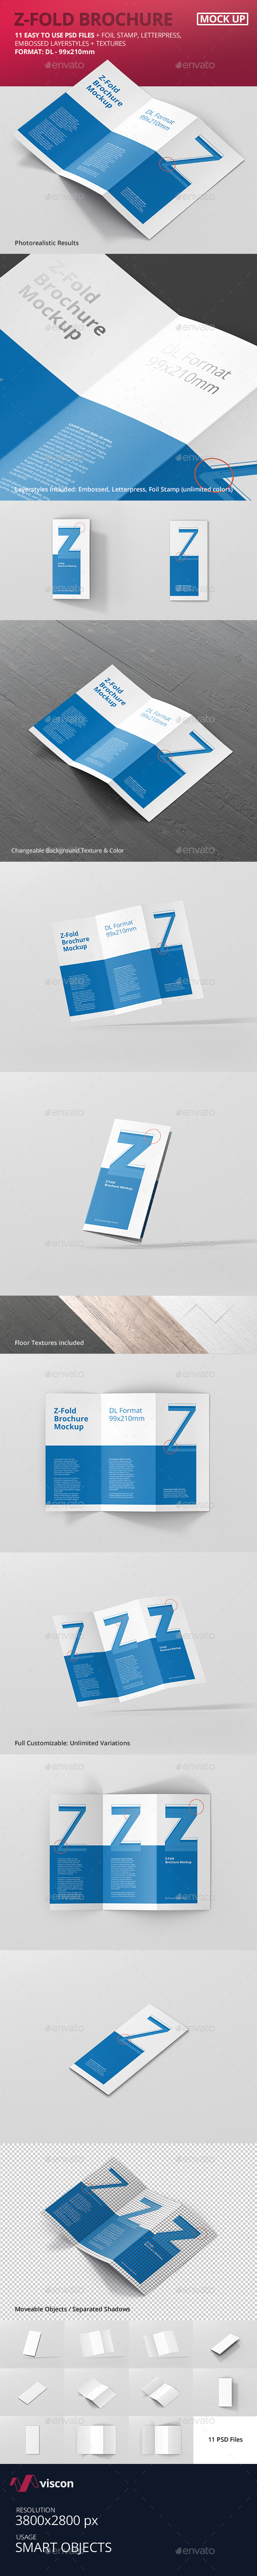 DL Z-Fold Brochure Mockup - 99x210mm - Brochures Print